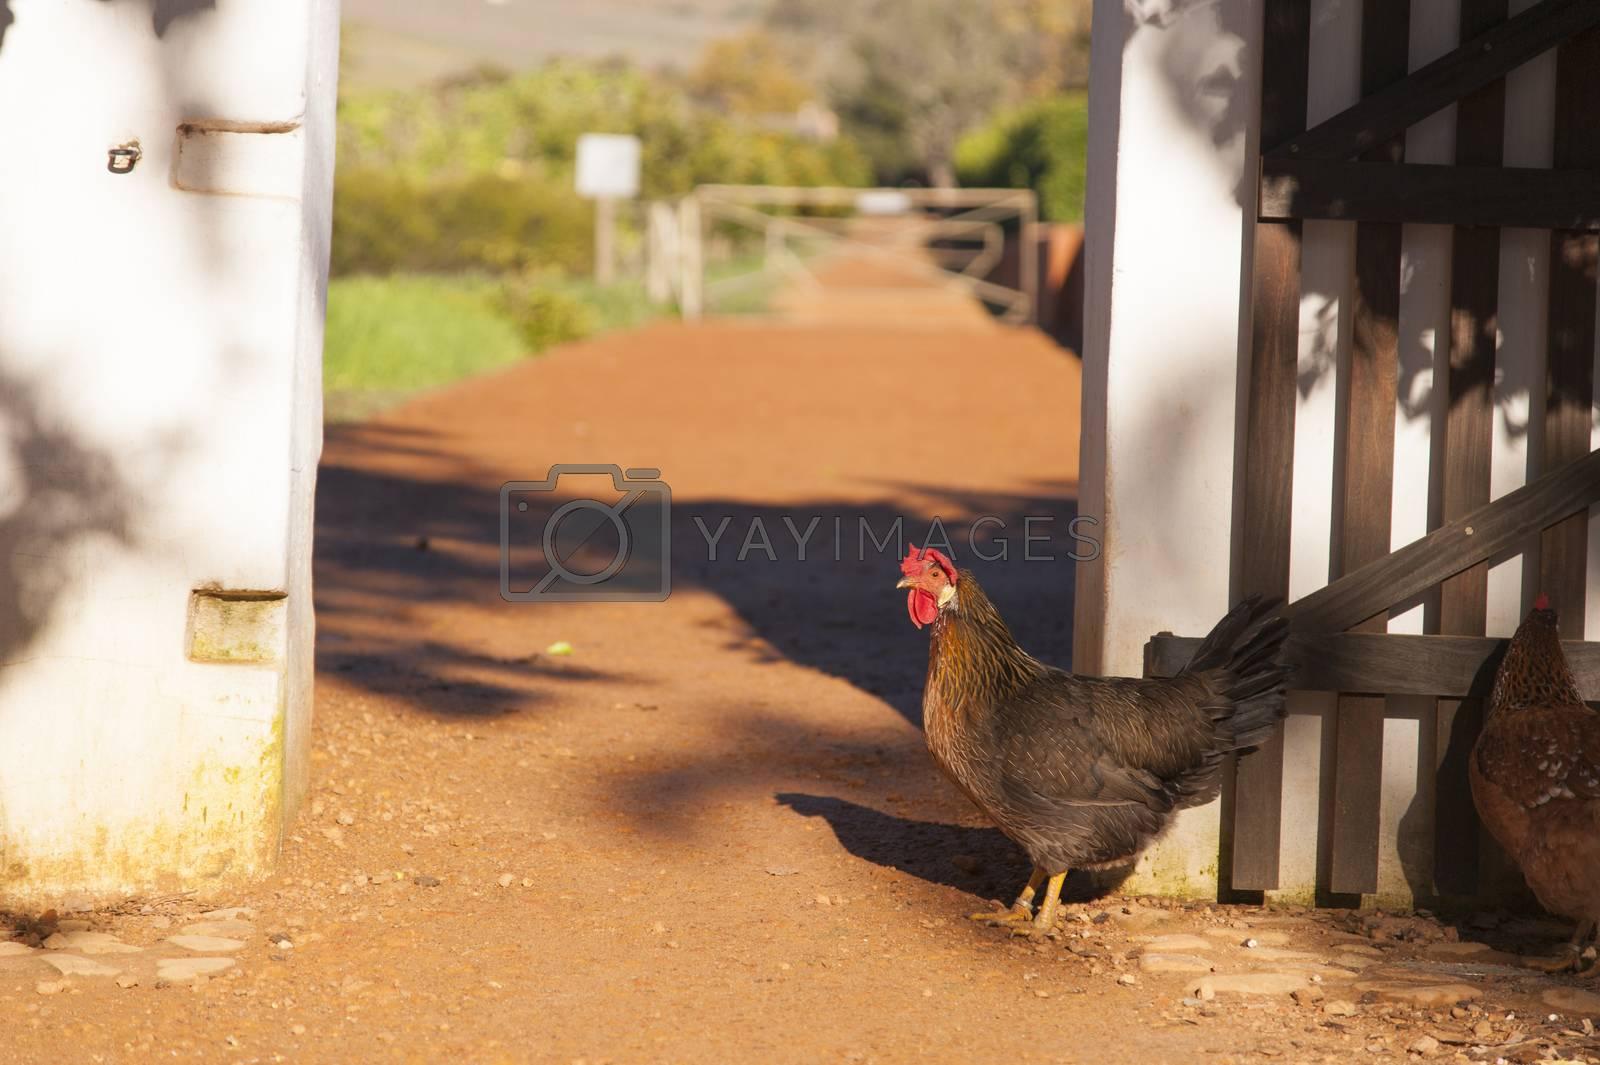 Chicken walking on red soil through a gate on a farm